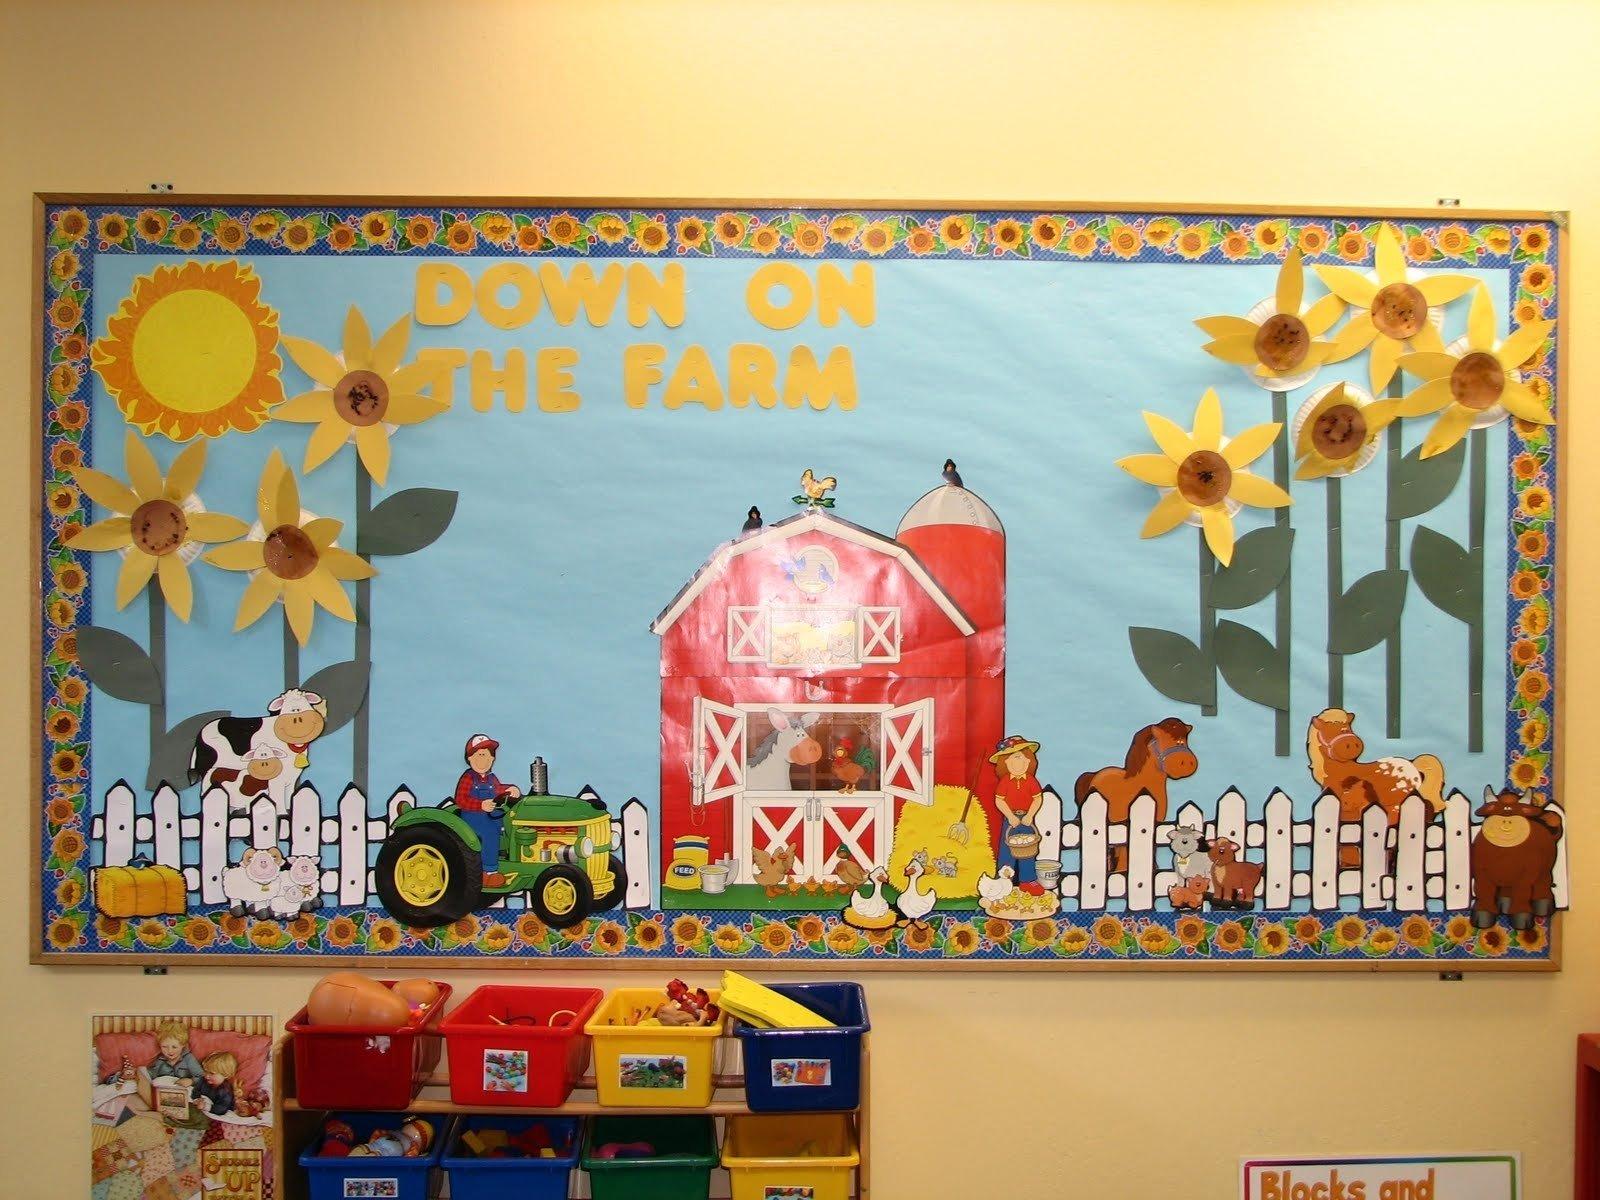 10 Trendy November Preschool Bulletin Board Ideas preschool ideas for 2 year olds back to school ideas 2 2020